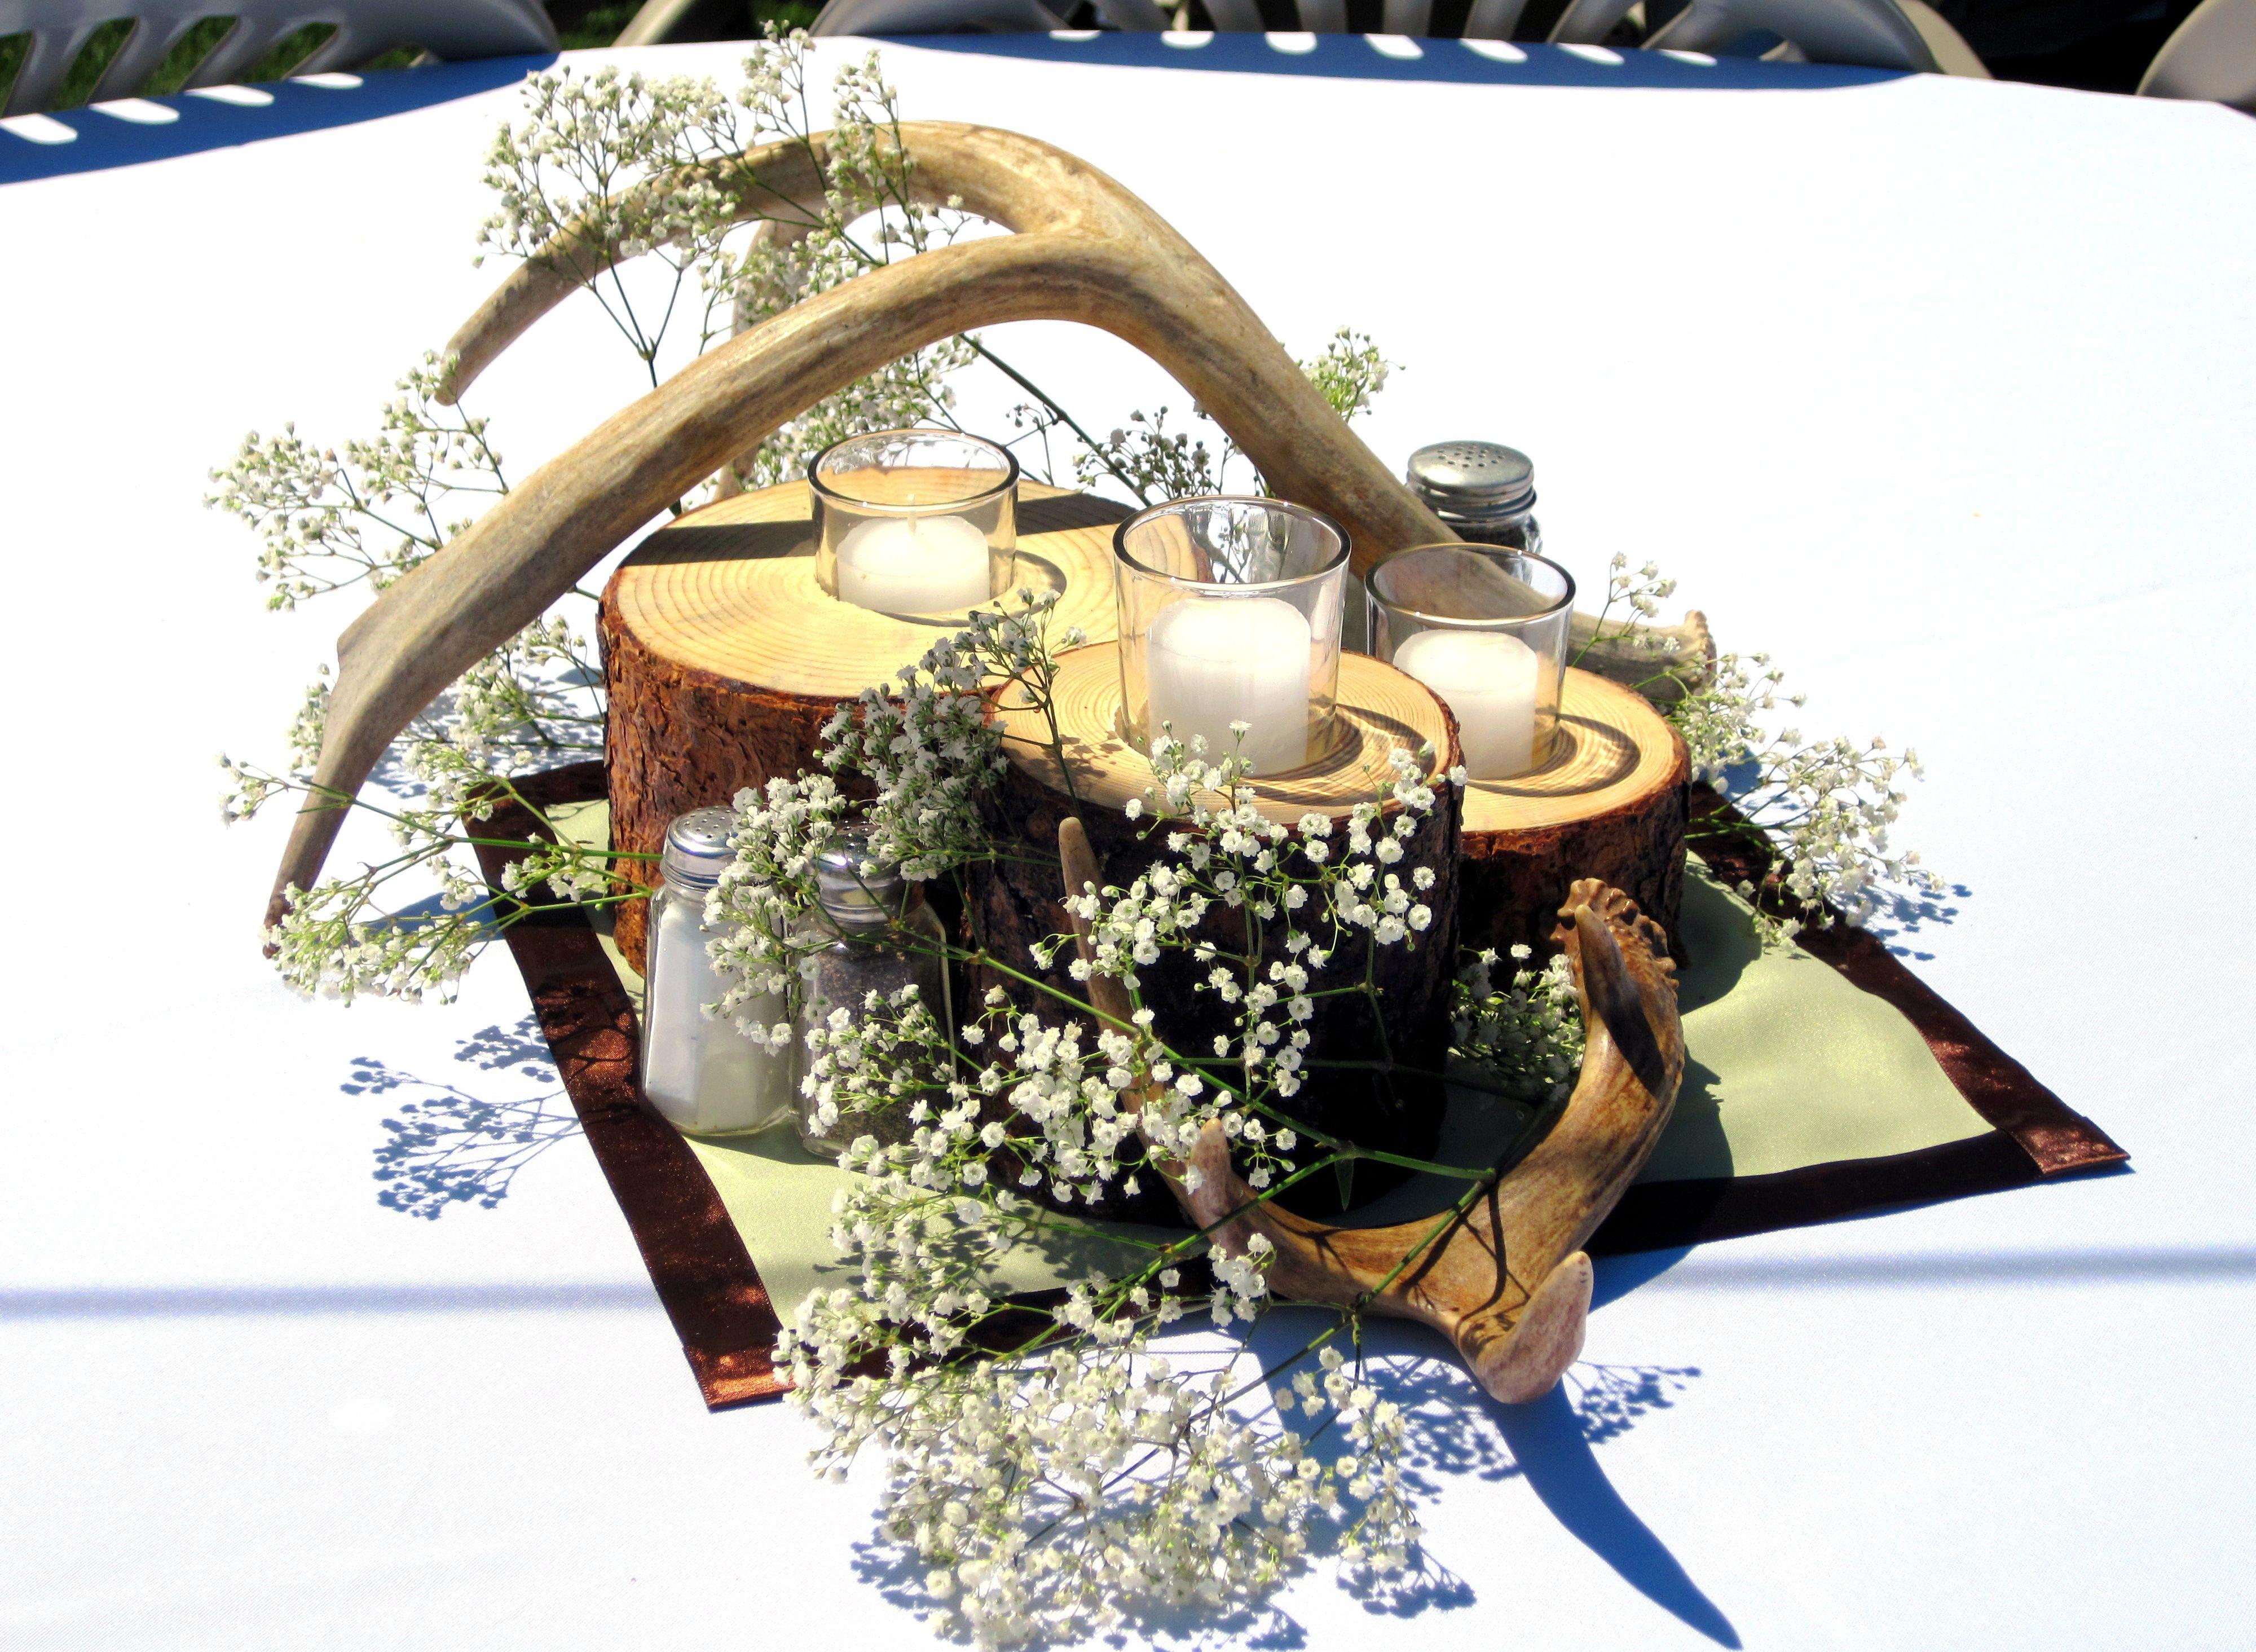 Western theme wedding logs turned into candle holders with antler western theme wedding logs turned into candle holders with antler decor and baby breath junglespirit Choice Image